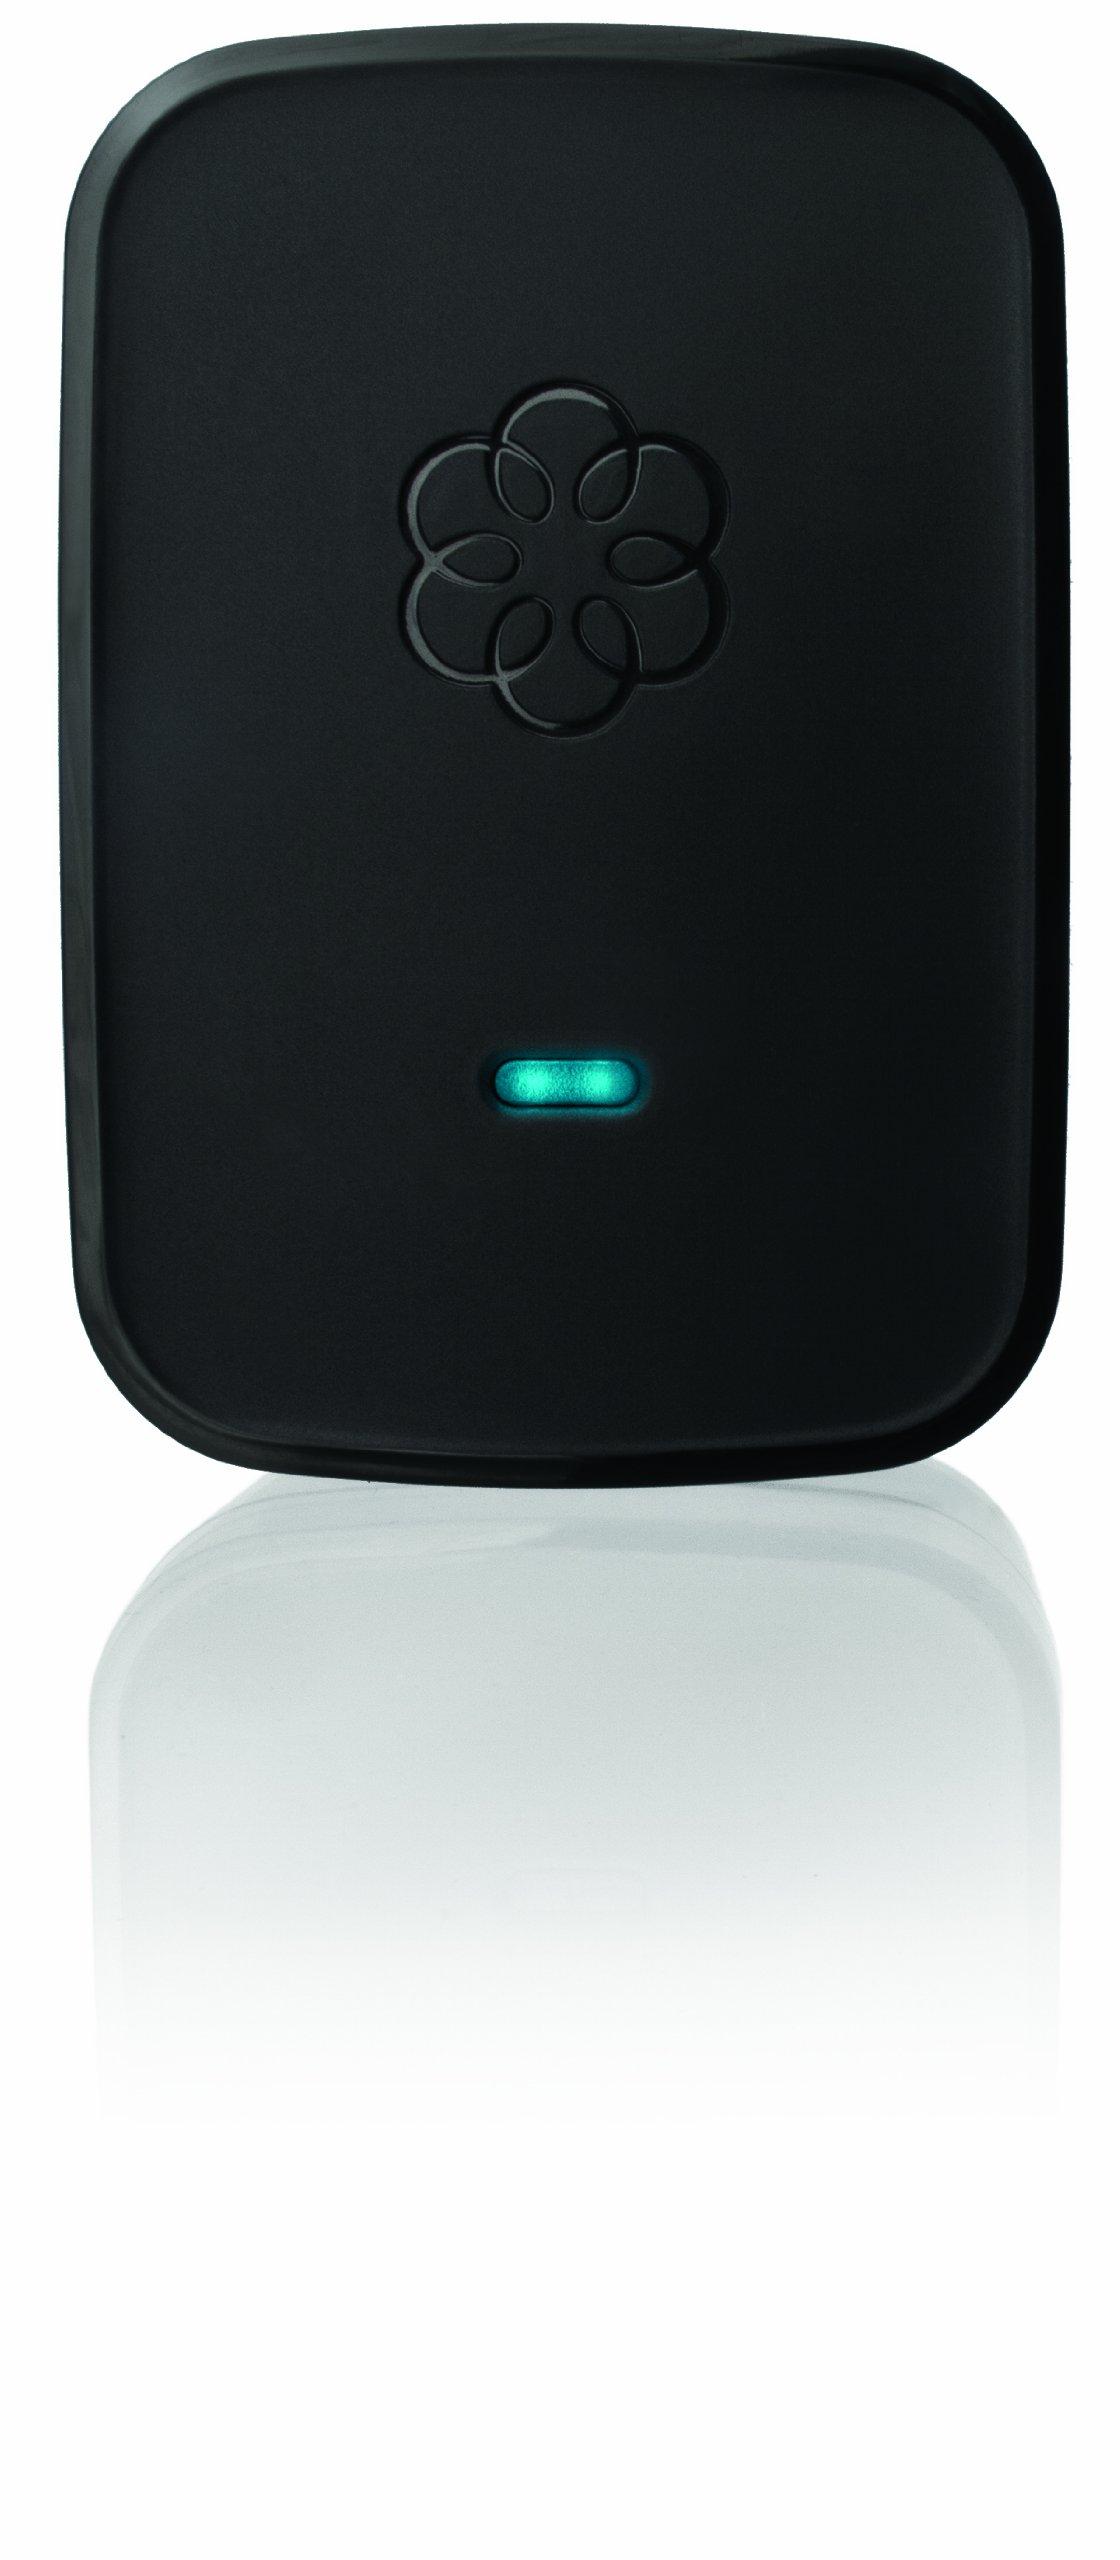 Ooma Linx Wireless Accessory For Ooma Telo Ebay